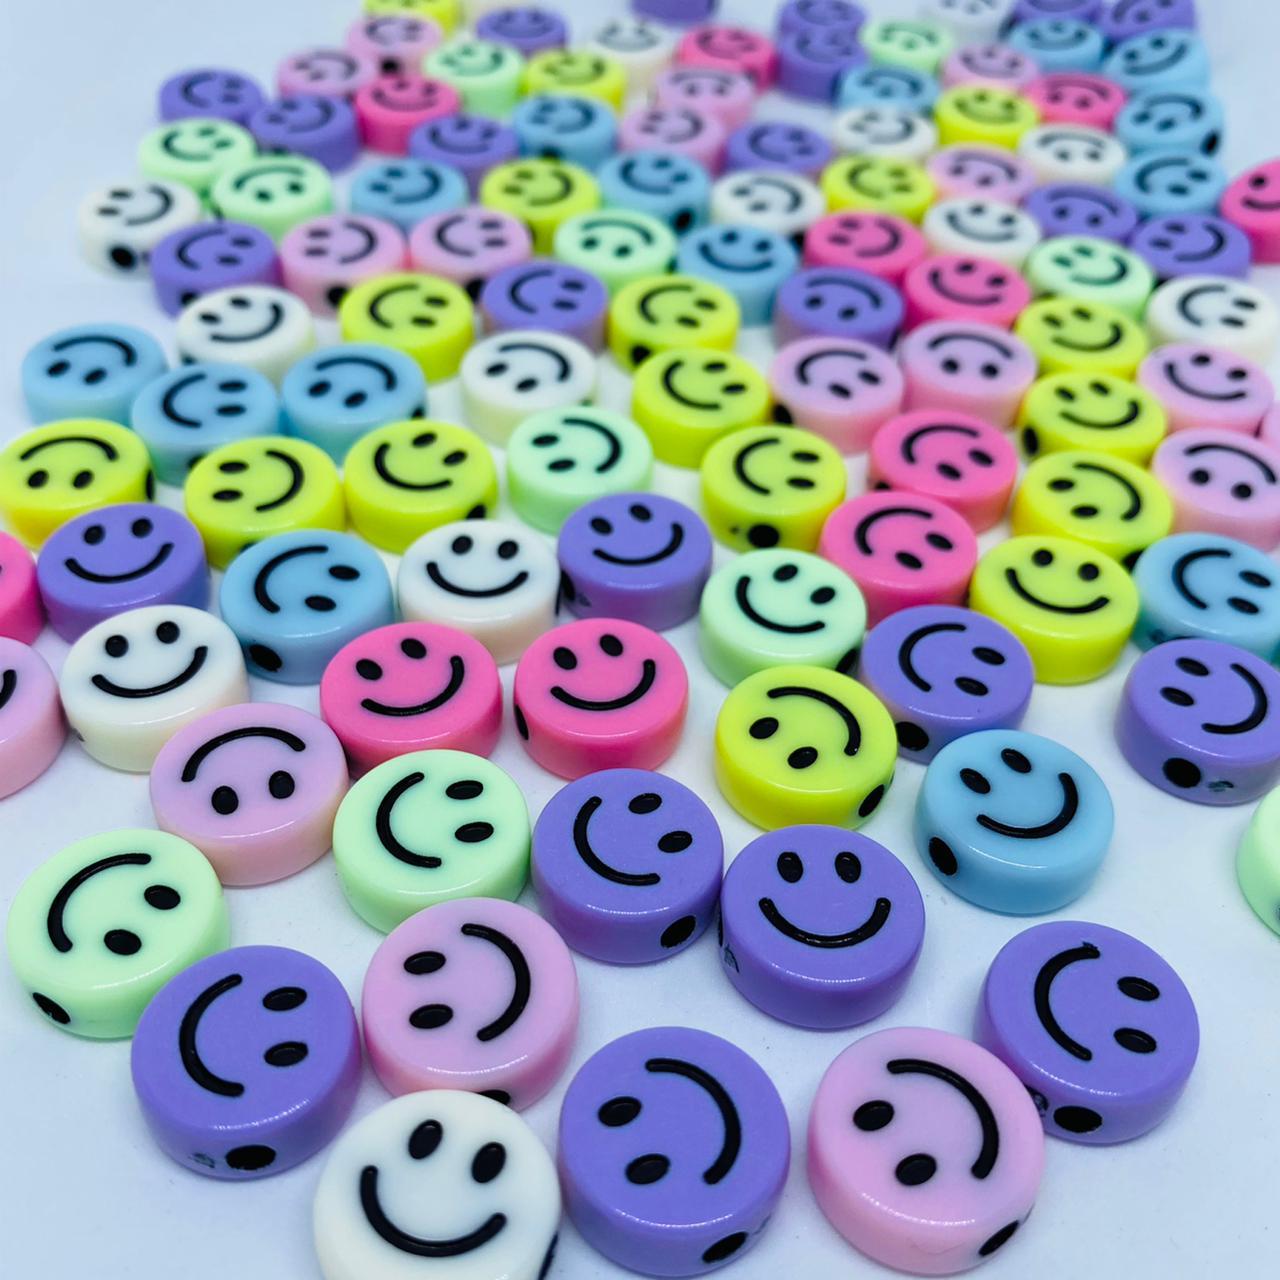 Miçanga - smile colorido 25 gr   - Palácio Dos Cristais